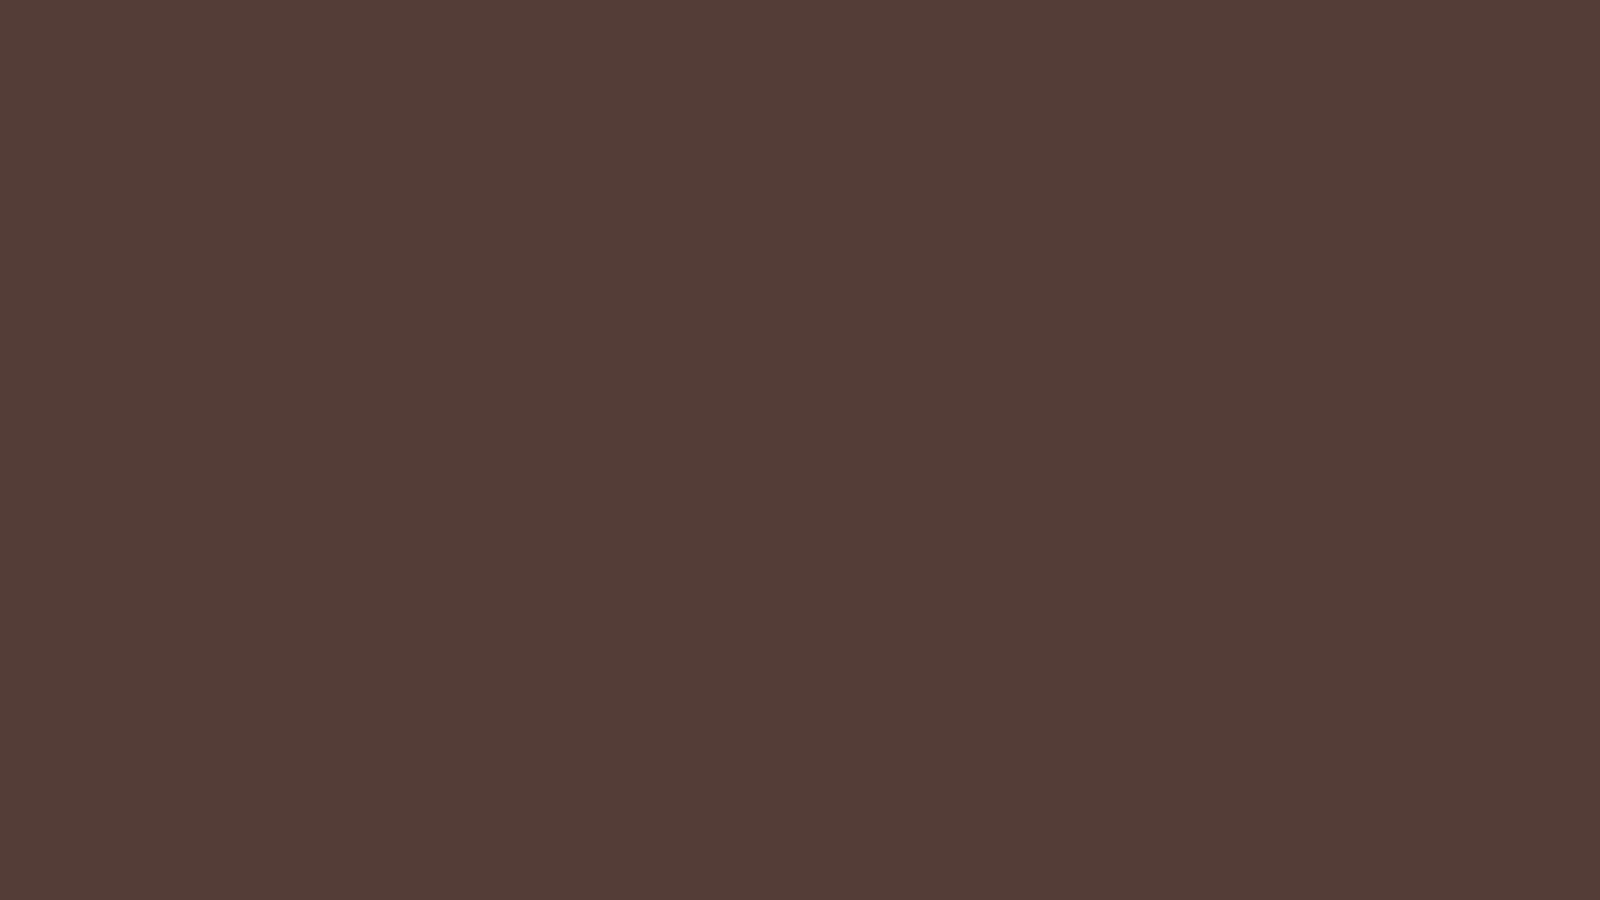 1600x900 Dark Liver Horses Solid Color Background